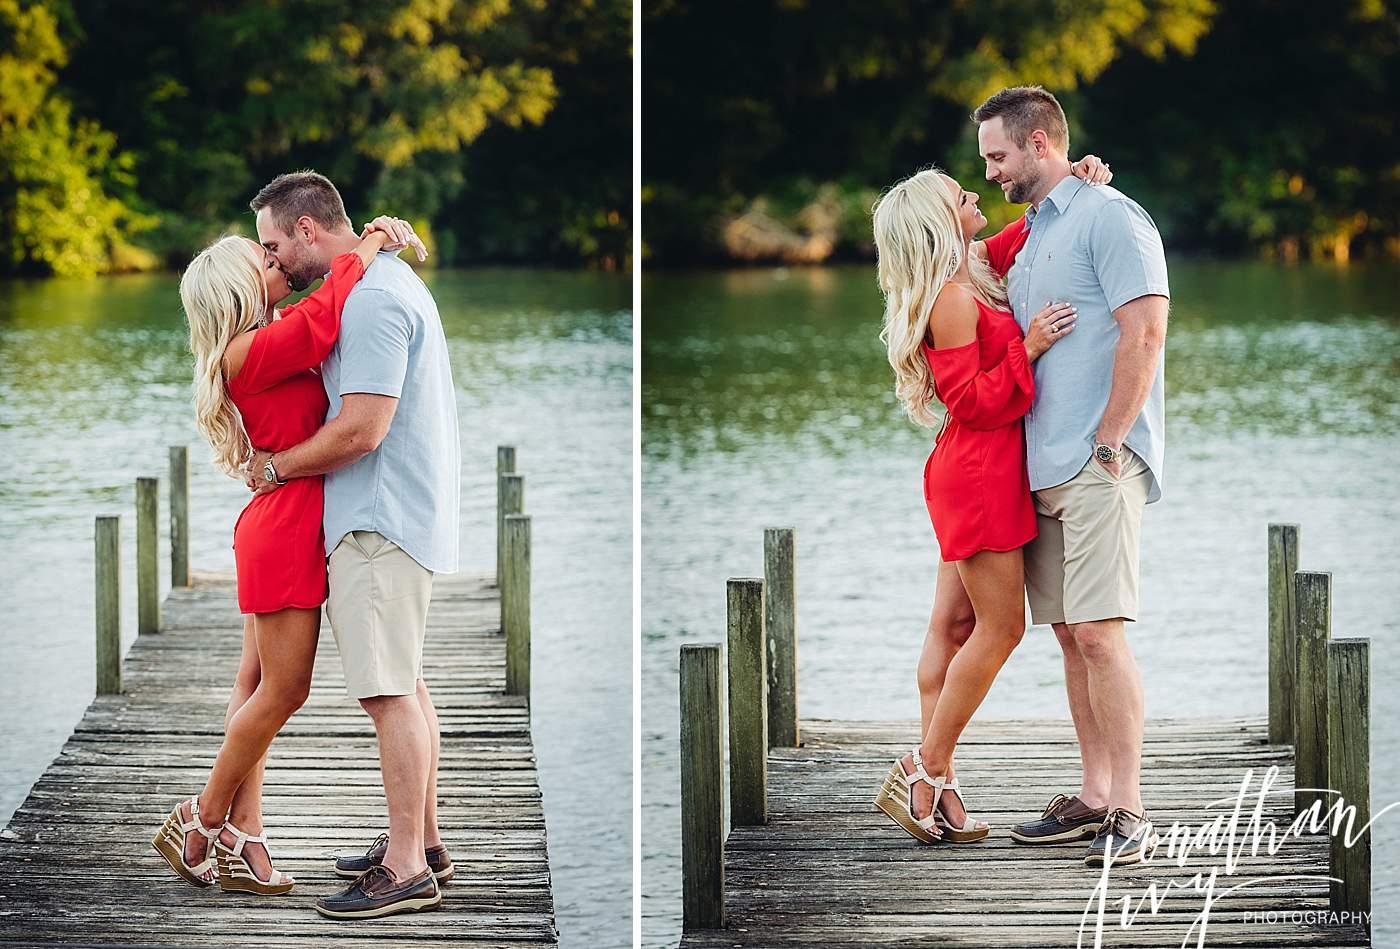 Destination Engagement Photos,Houston Wedding Photographer,The Woodlands Wedding Photographer,